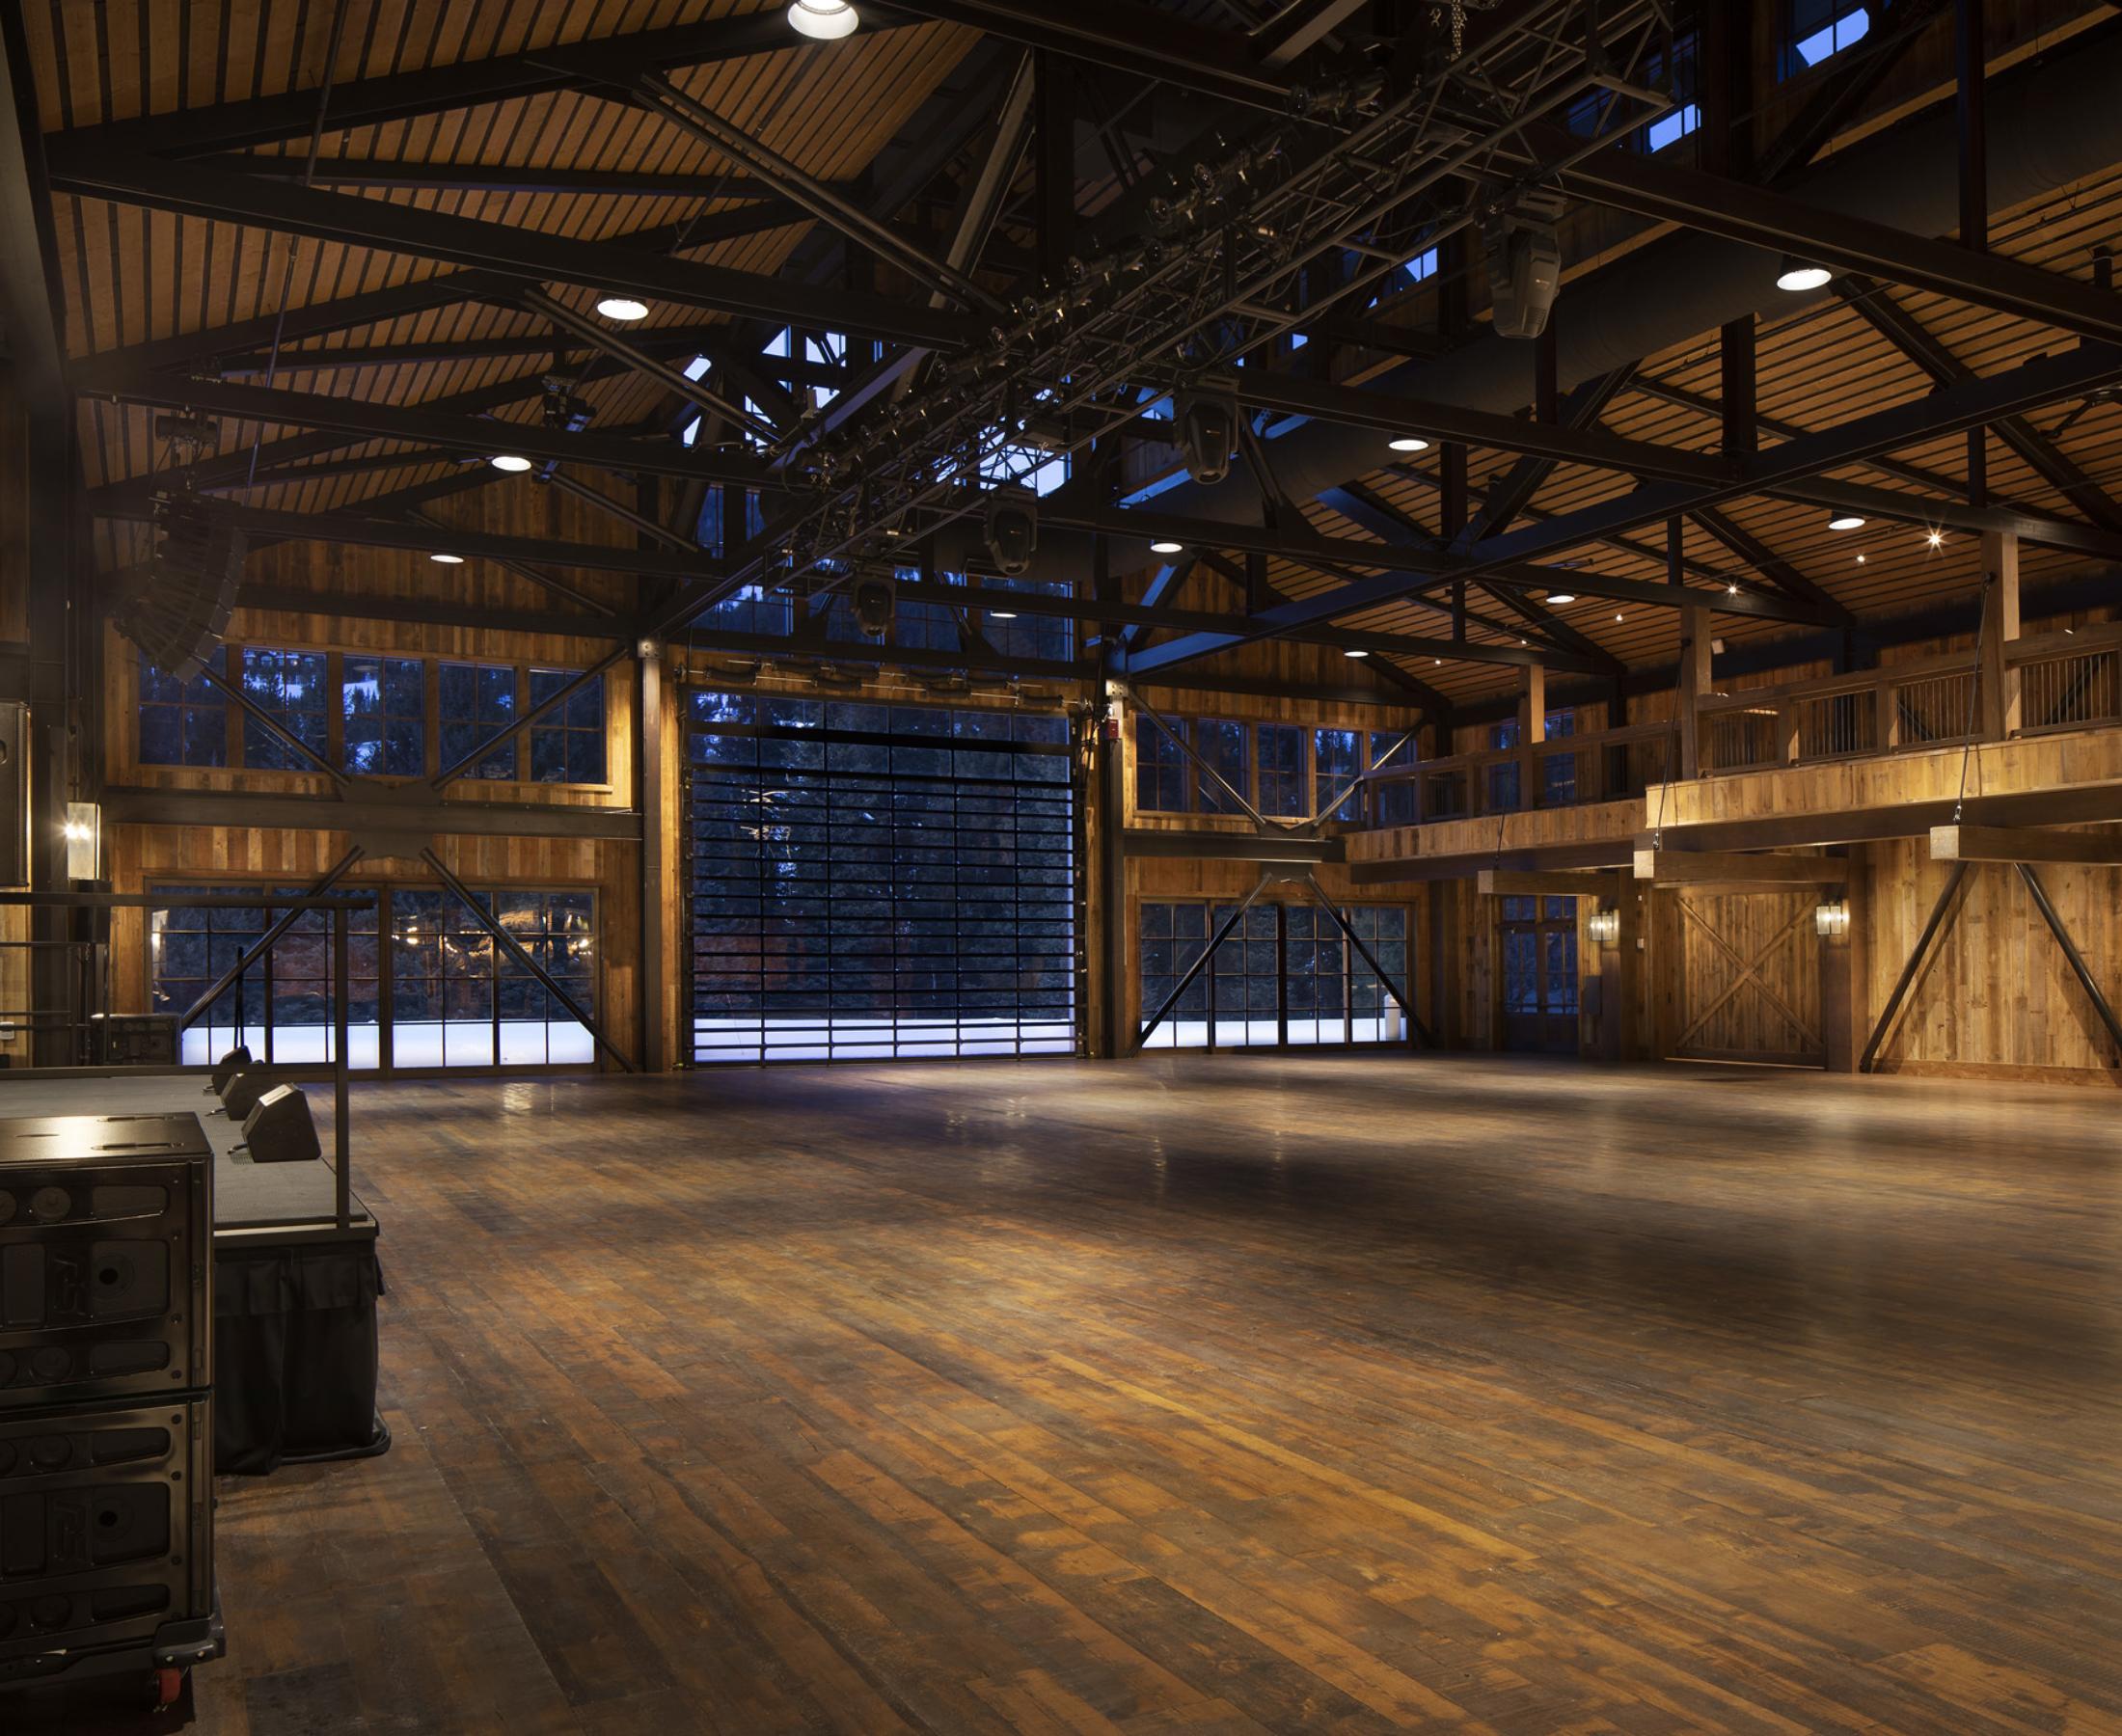 Yc 2002 Barn Interiors 0064 Jpeg Web Portfolio